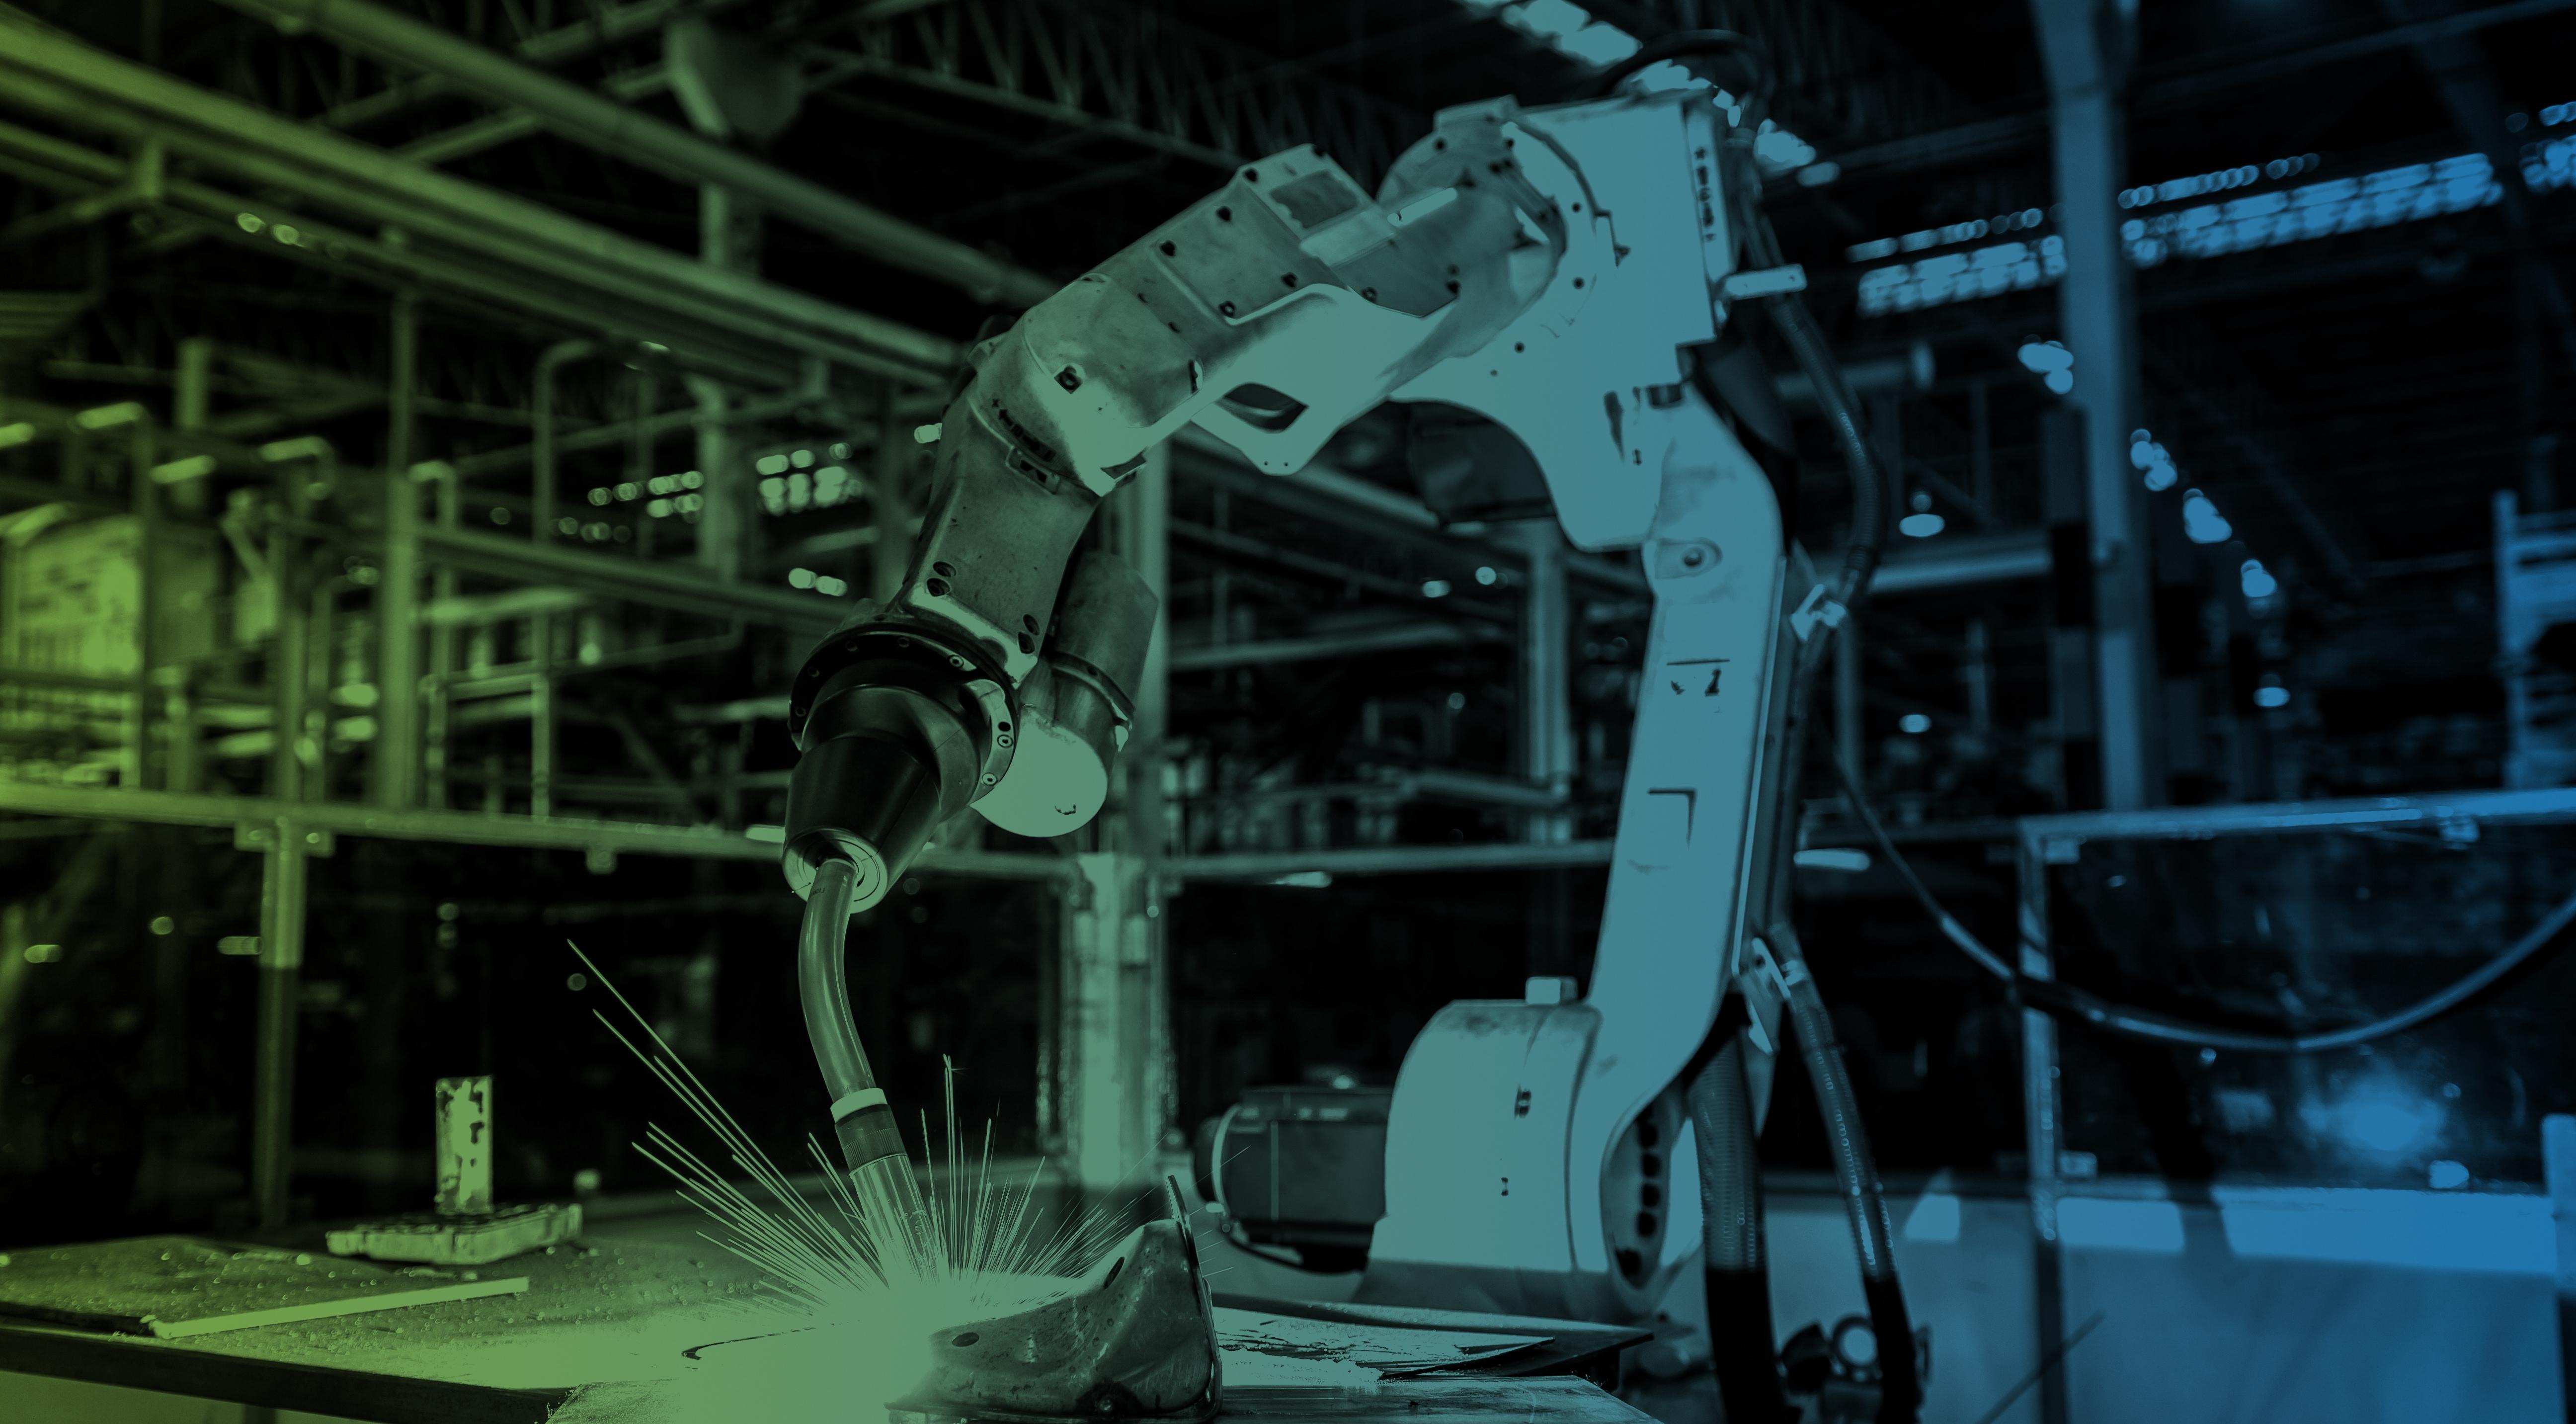 Manufacturing_DUO_A